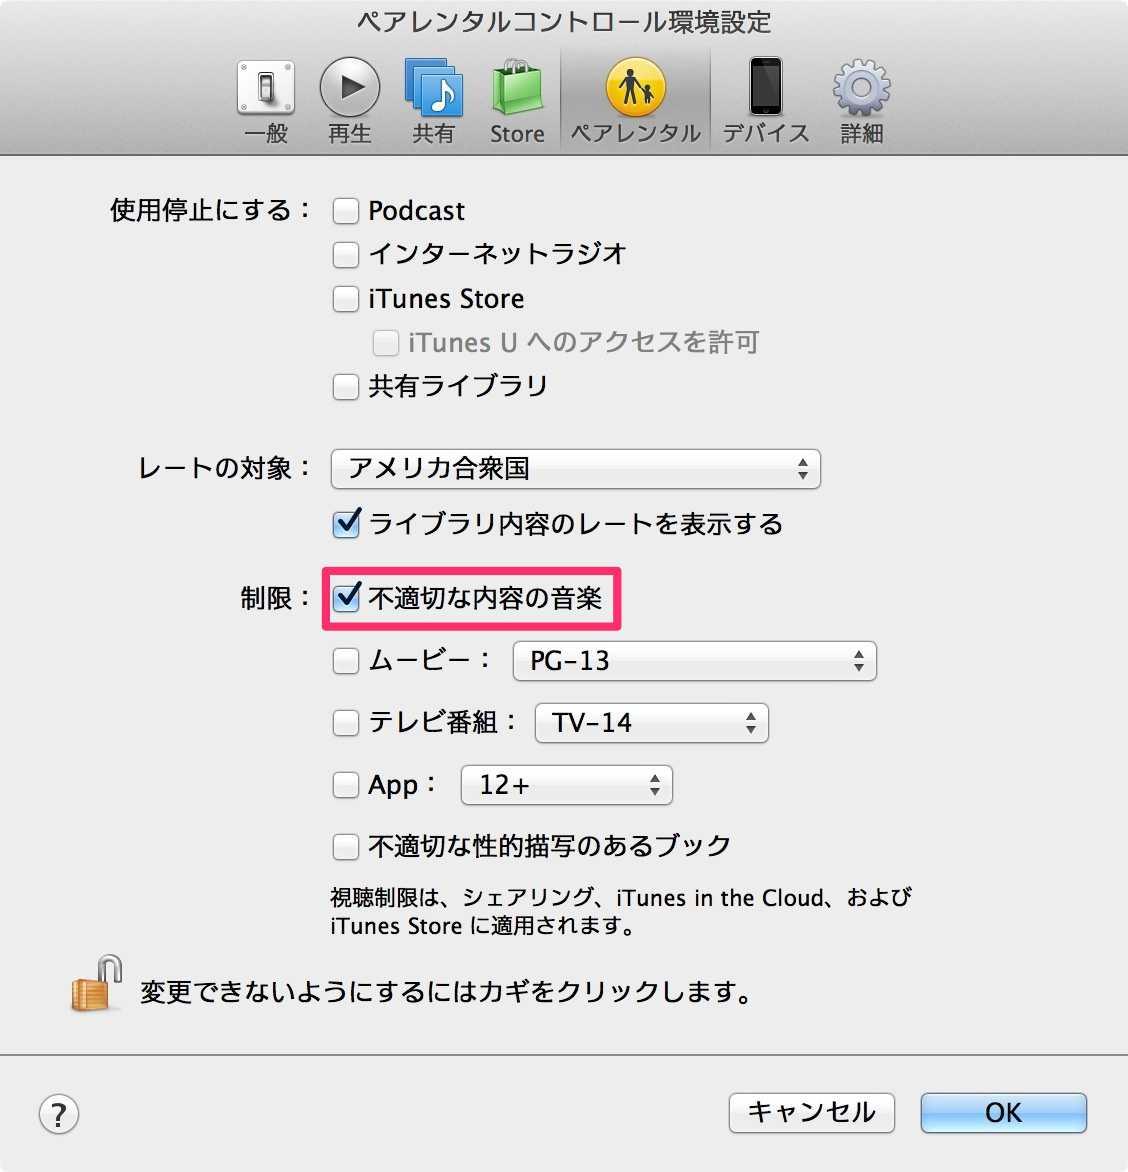 iTunes Storeでたまに見かける赤文字の「EXPLICIT」の意味とは?